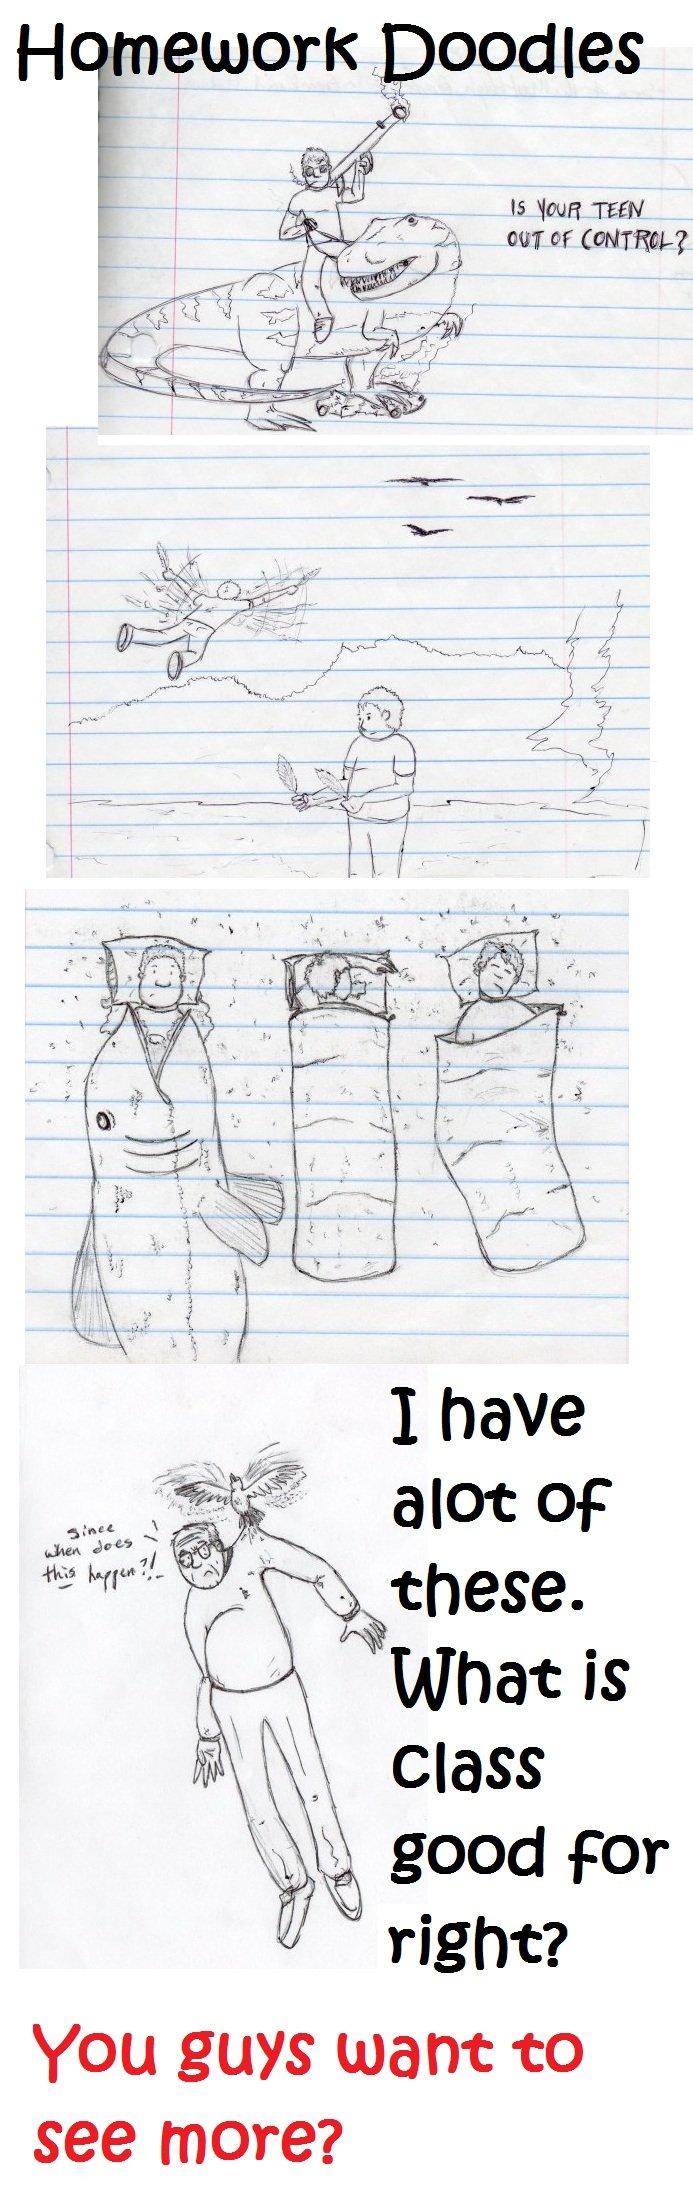 "Homework Doodles.. Did somebody say ""alot""? ^^^^ warkoch homework Doodles"